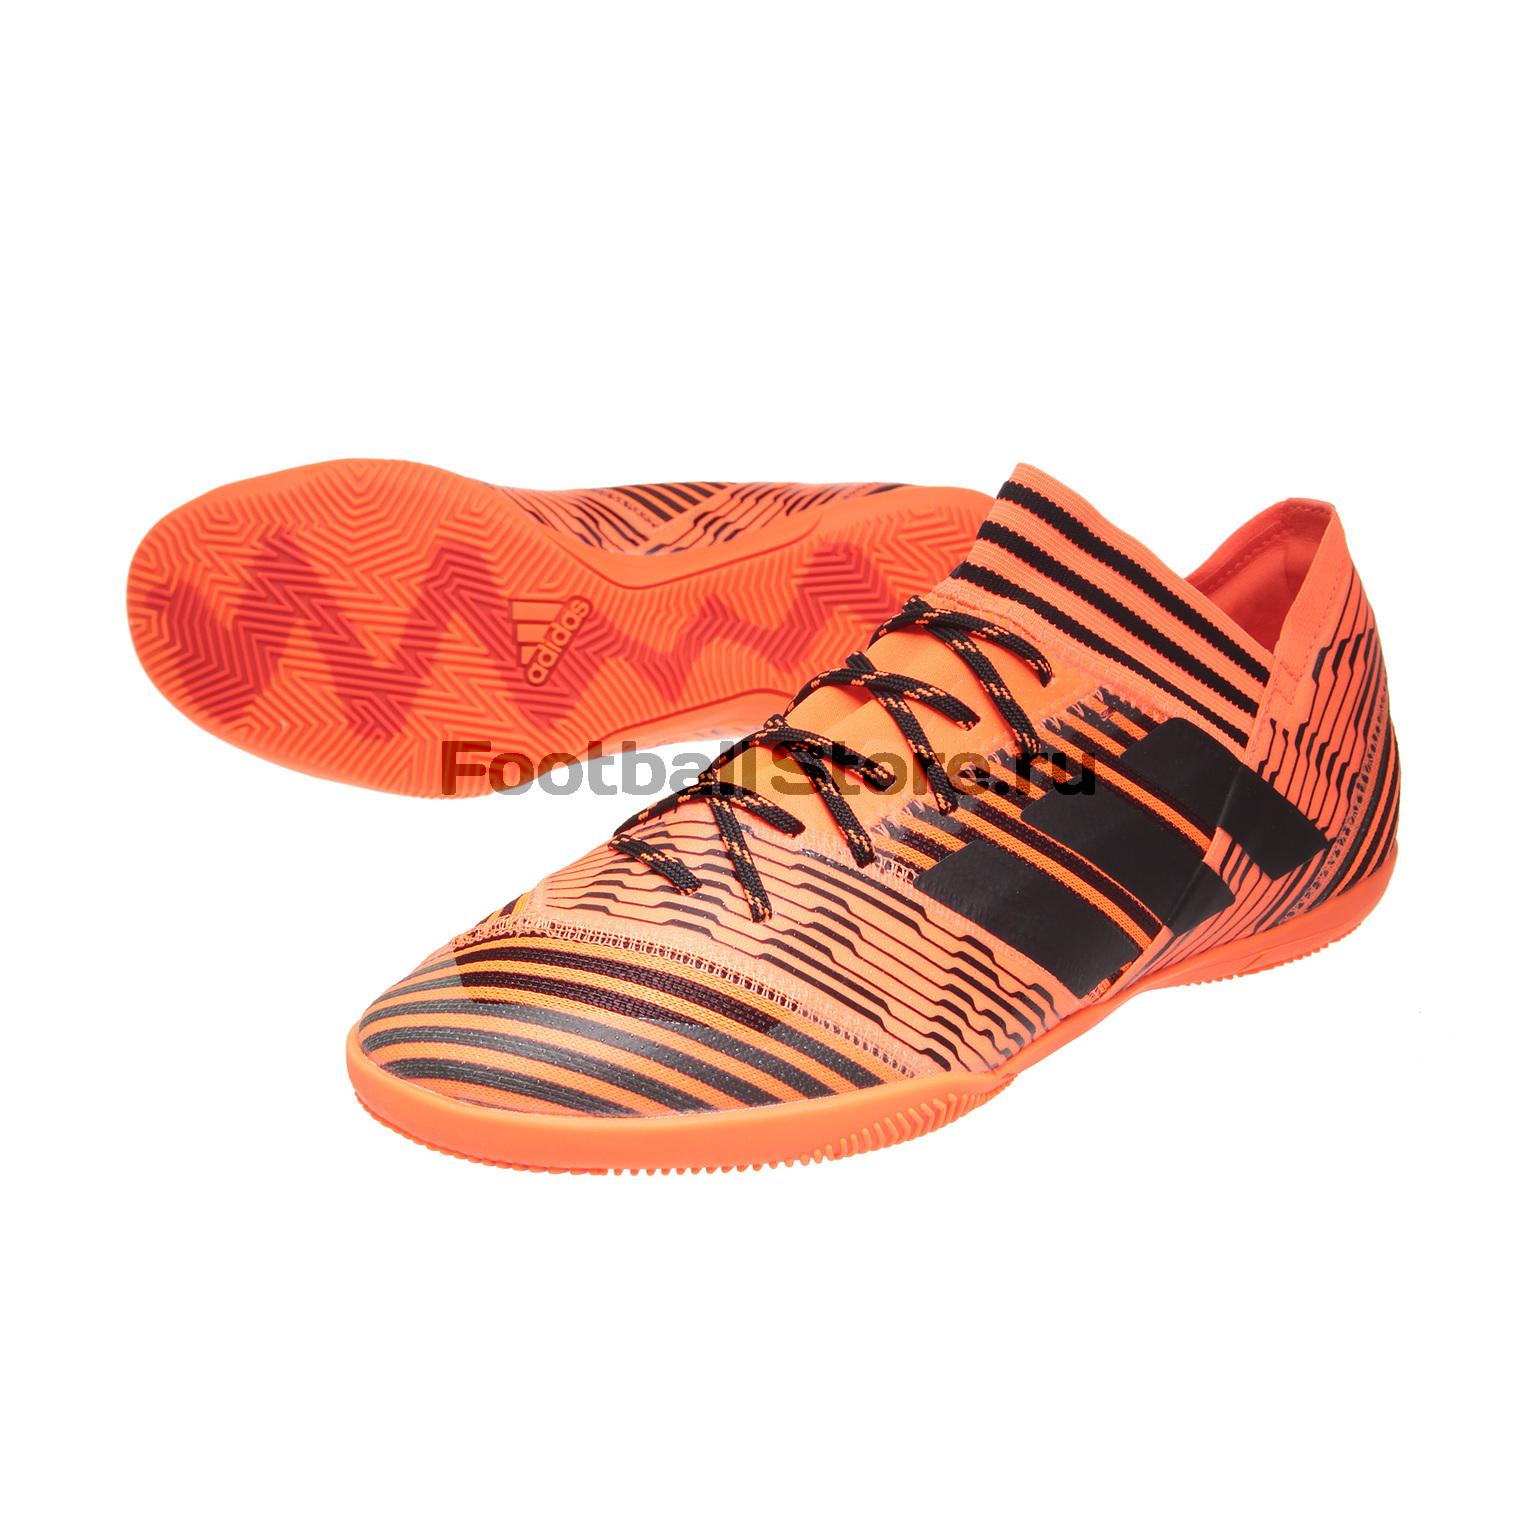 Обувь для зала Adidas Nemeziz Tango 17.3 IN BY2815 обувь для зала adidas nemeziz tango 17 3 in jr cp9182